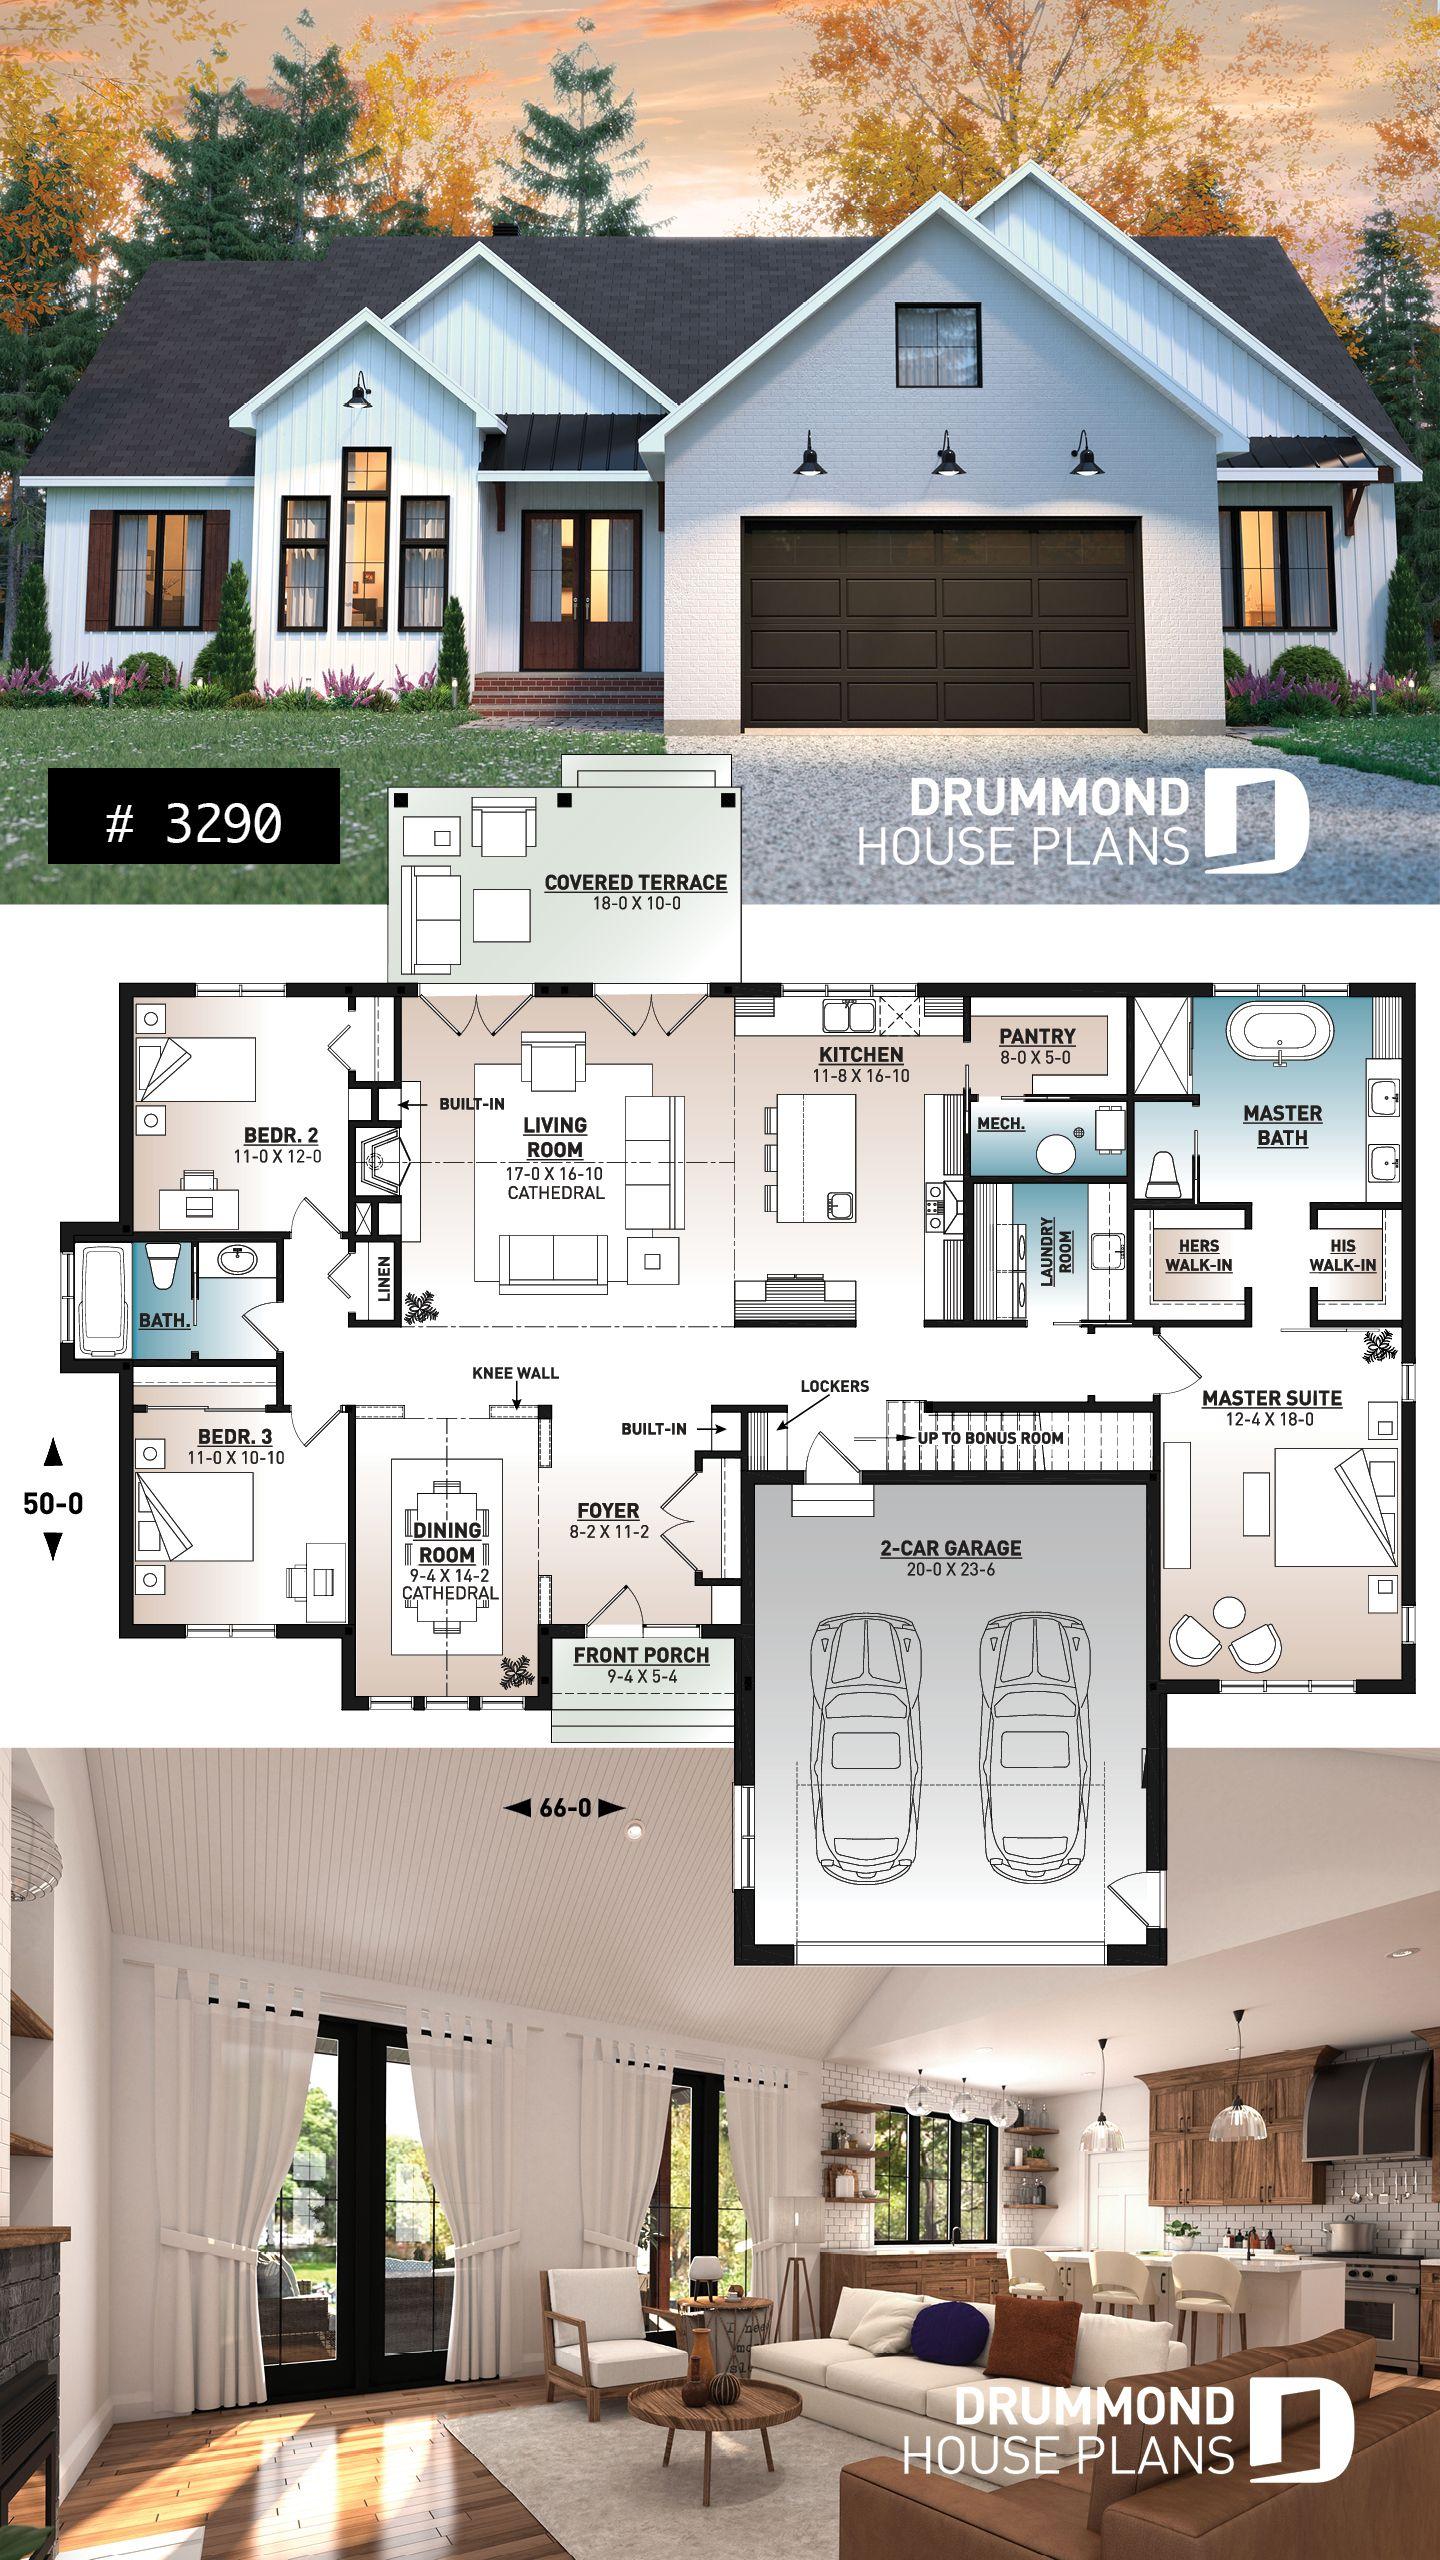 Modern Farmhouse House Plan My House Plans House Plans Farmhouse New House Plans